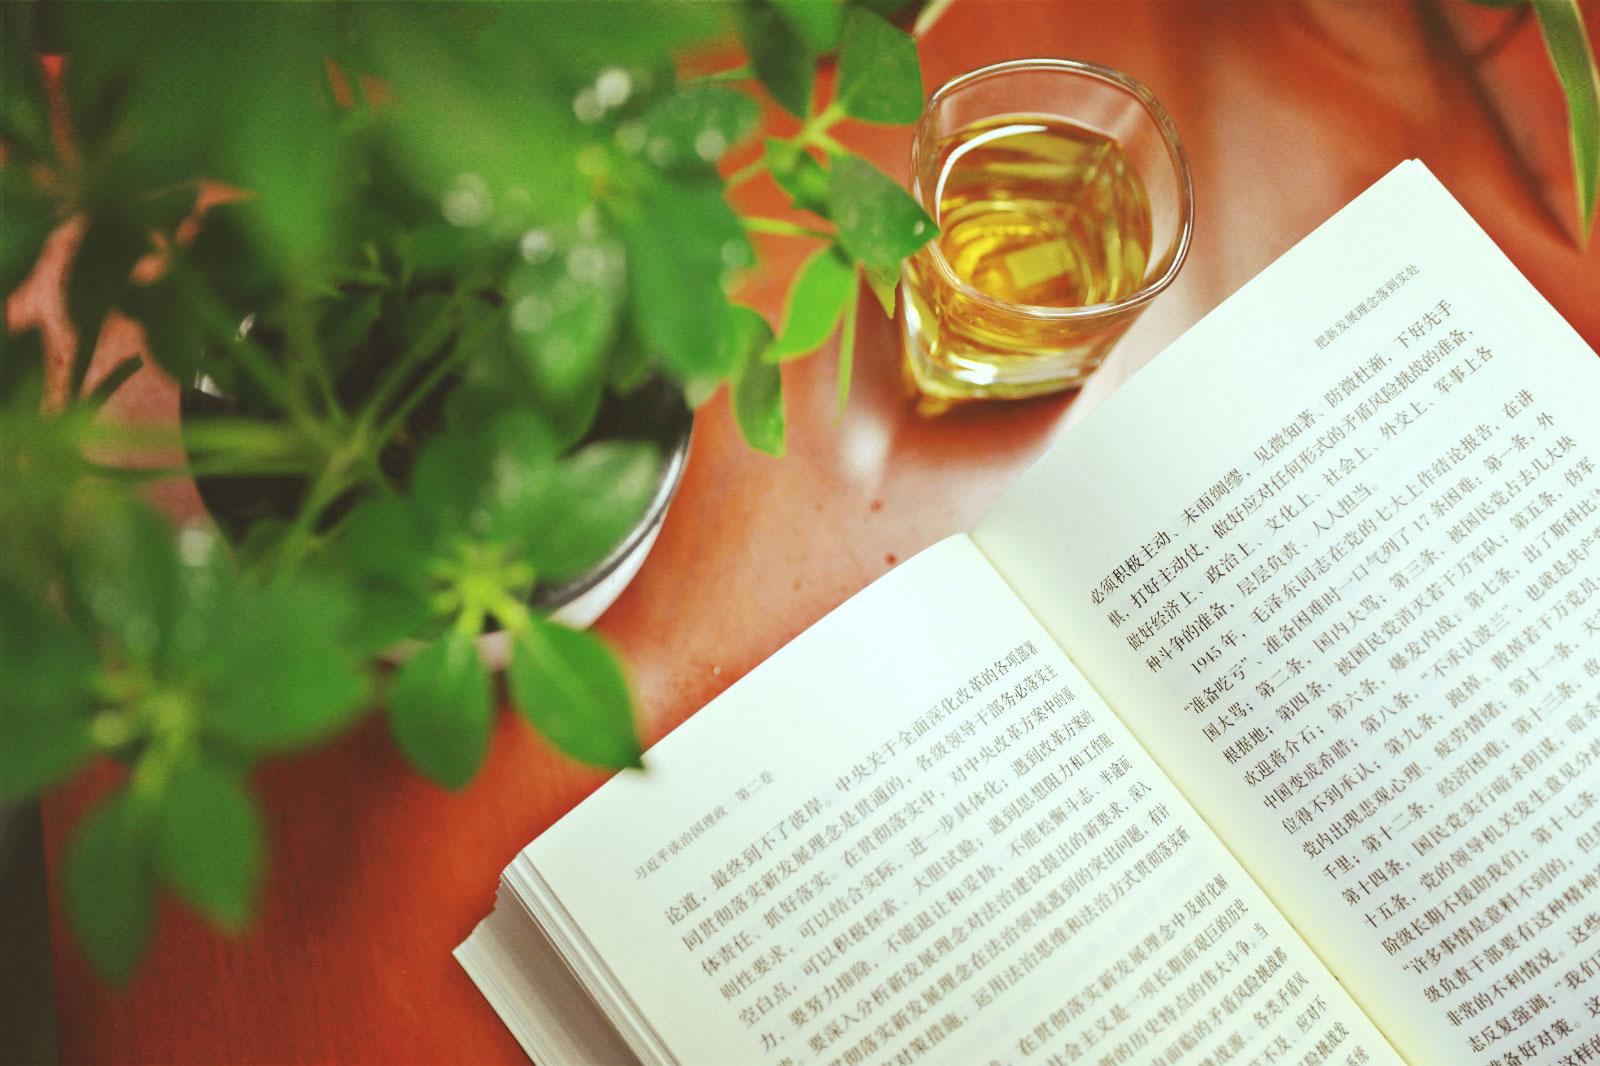 World Book Day celebrated online amid COVID-19 lockdown: UNESCO